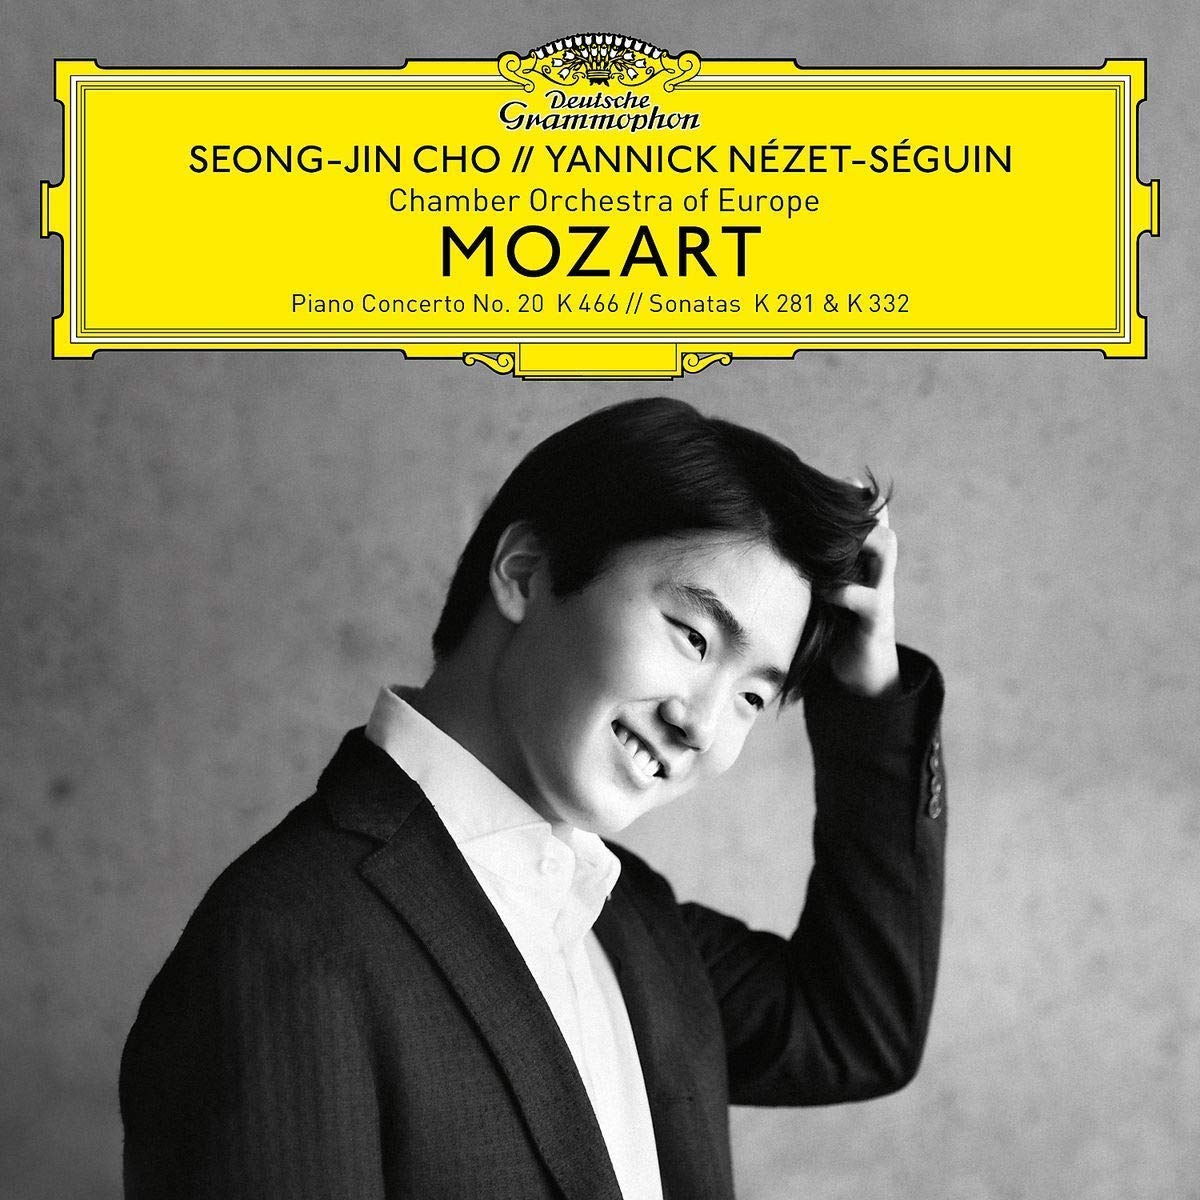 Cho/n'zet-S'guin/chamber Orchestra Of Europe - Mozart Piano Concerto No. 20, K. 466; Sonatas, K. 281 & 332